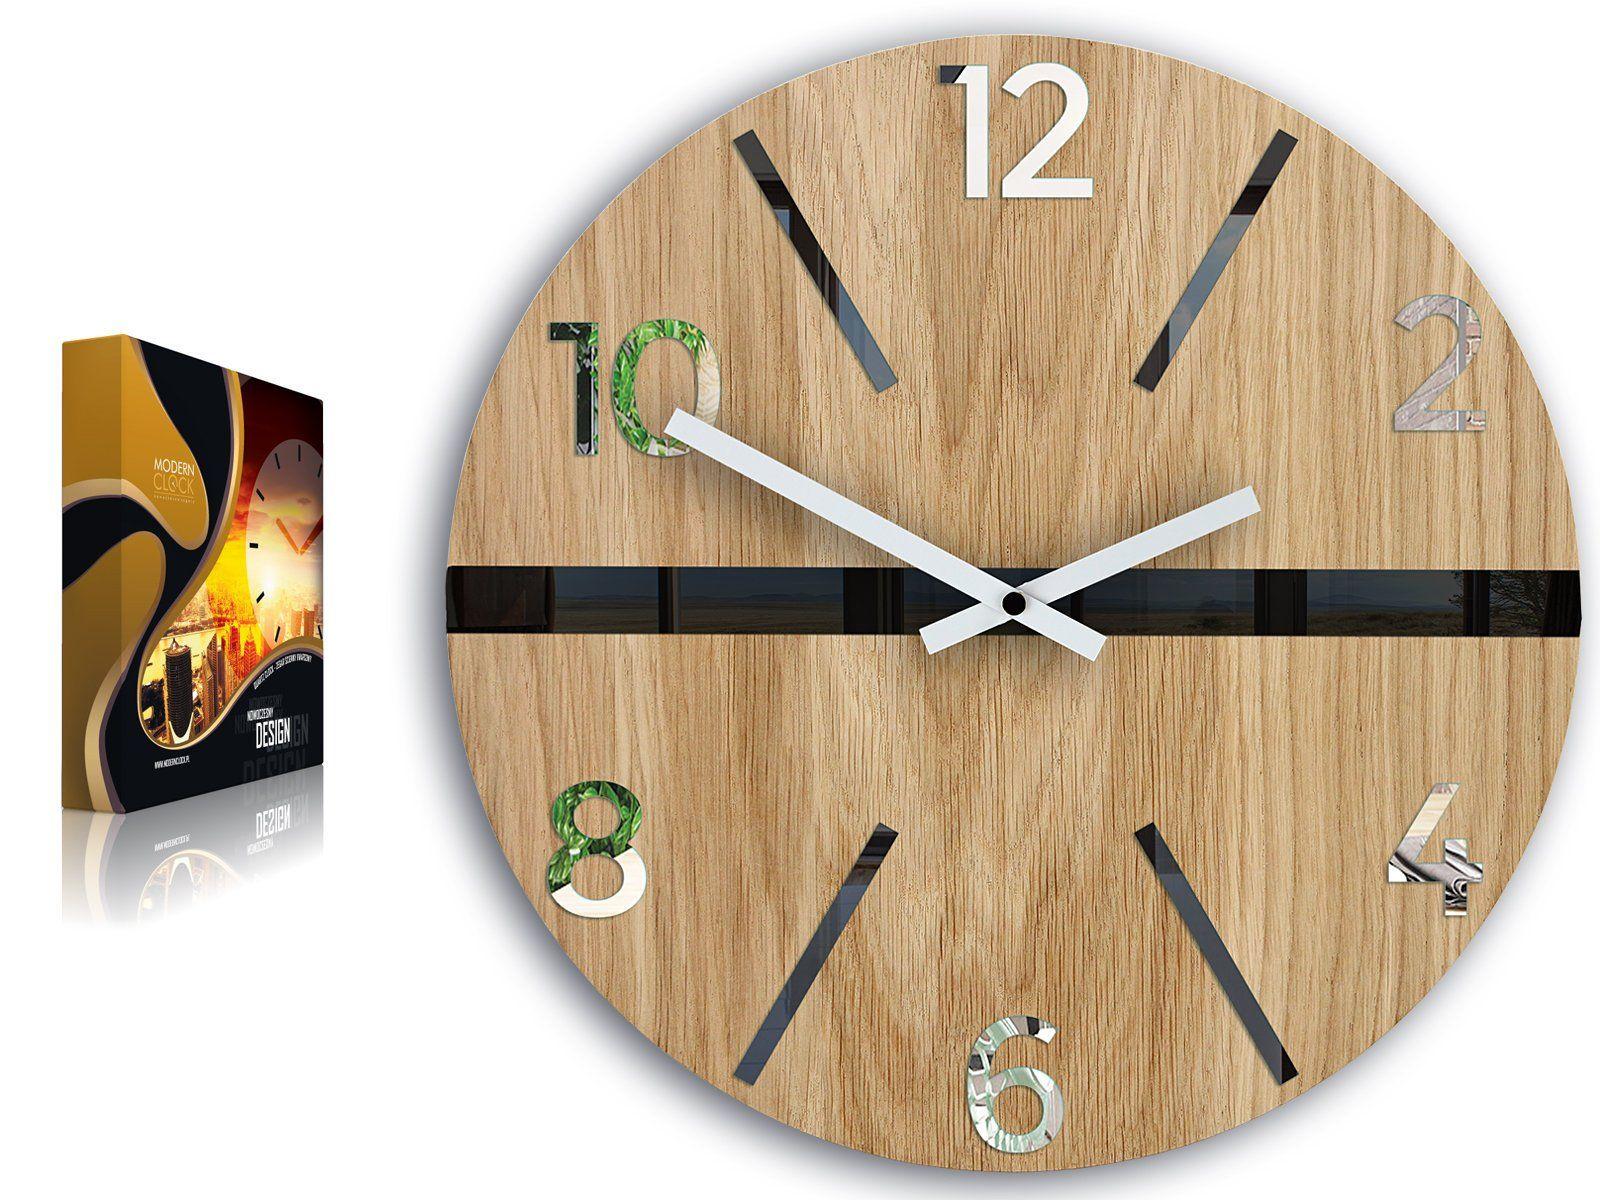 Wall Clock In Scandinavian Style White Black And Mirror Etsy Zegar Scienny Zegar Lustro